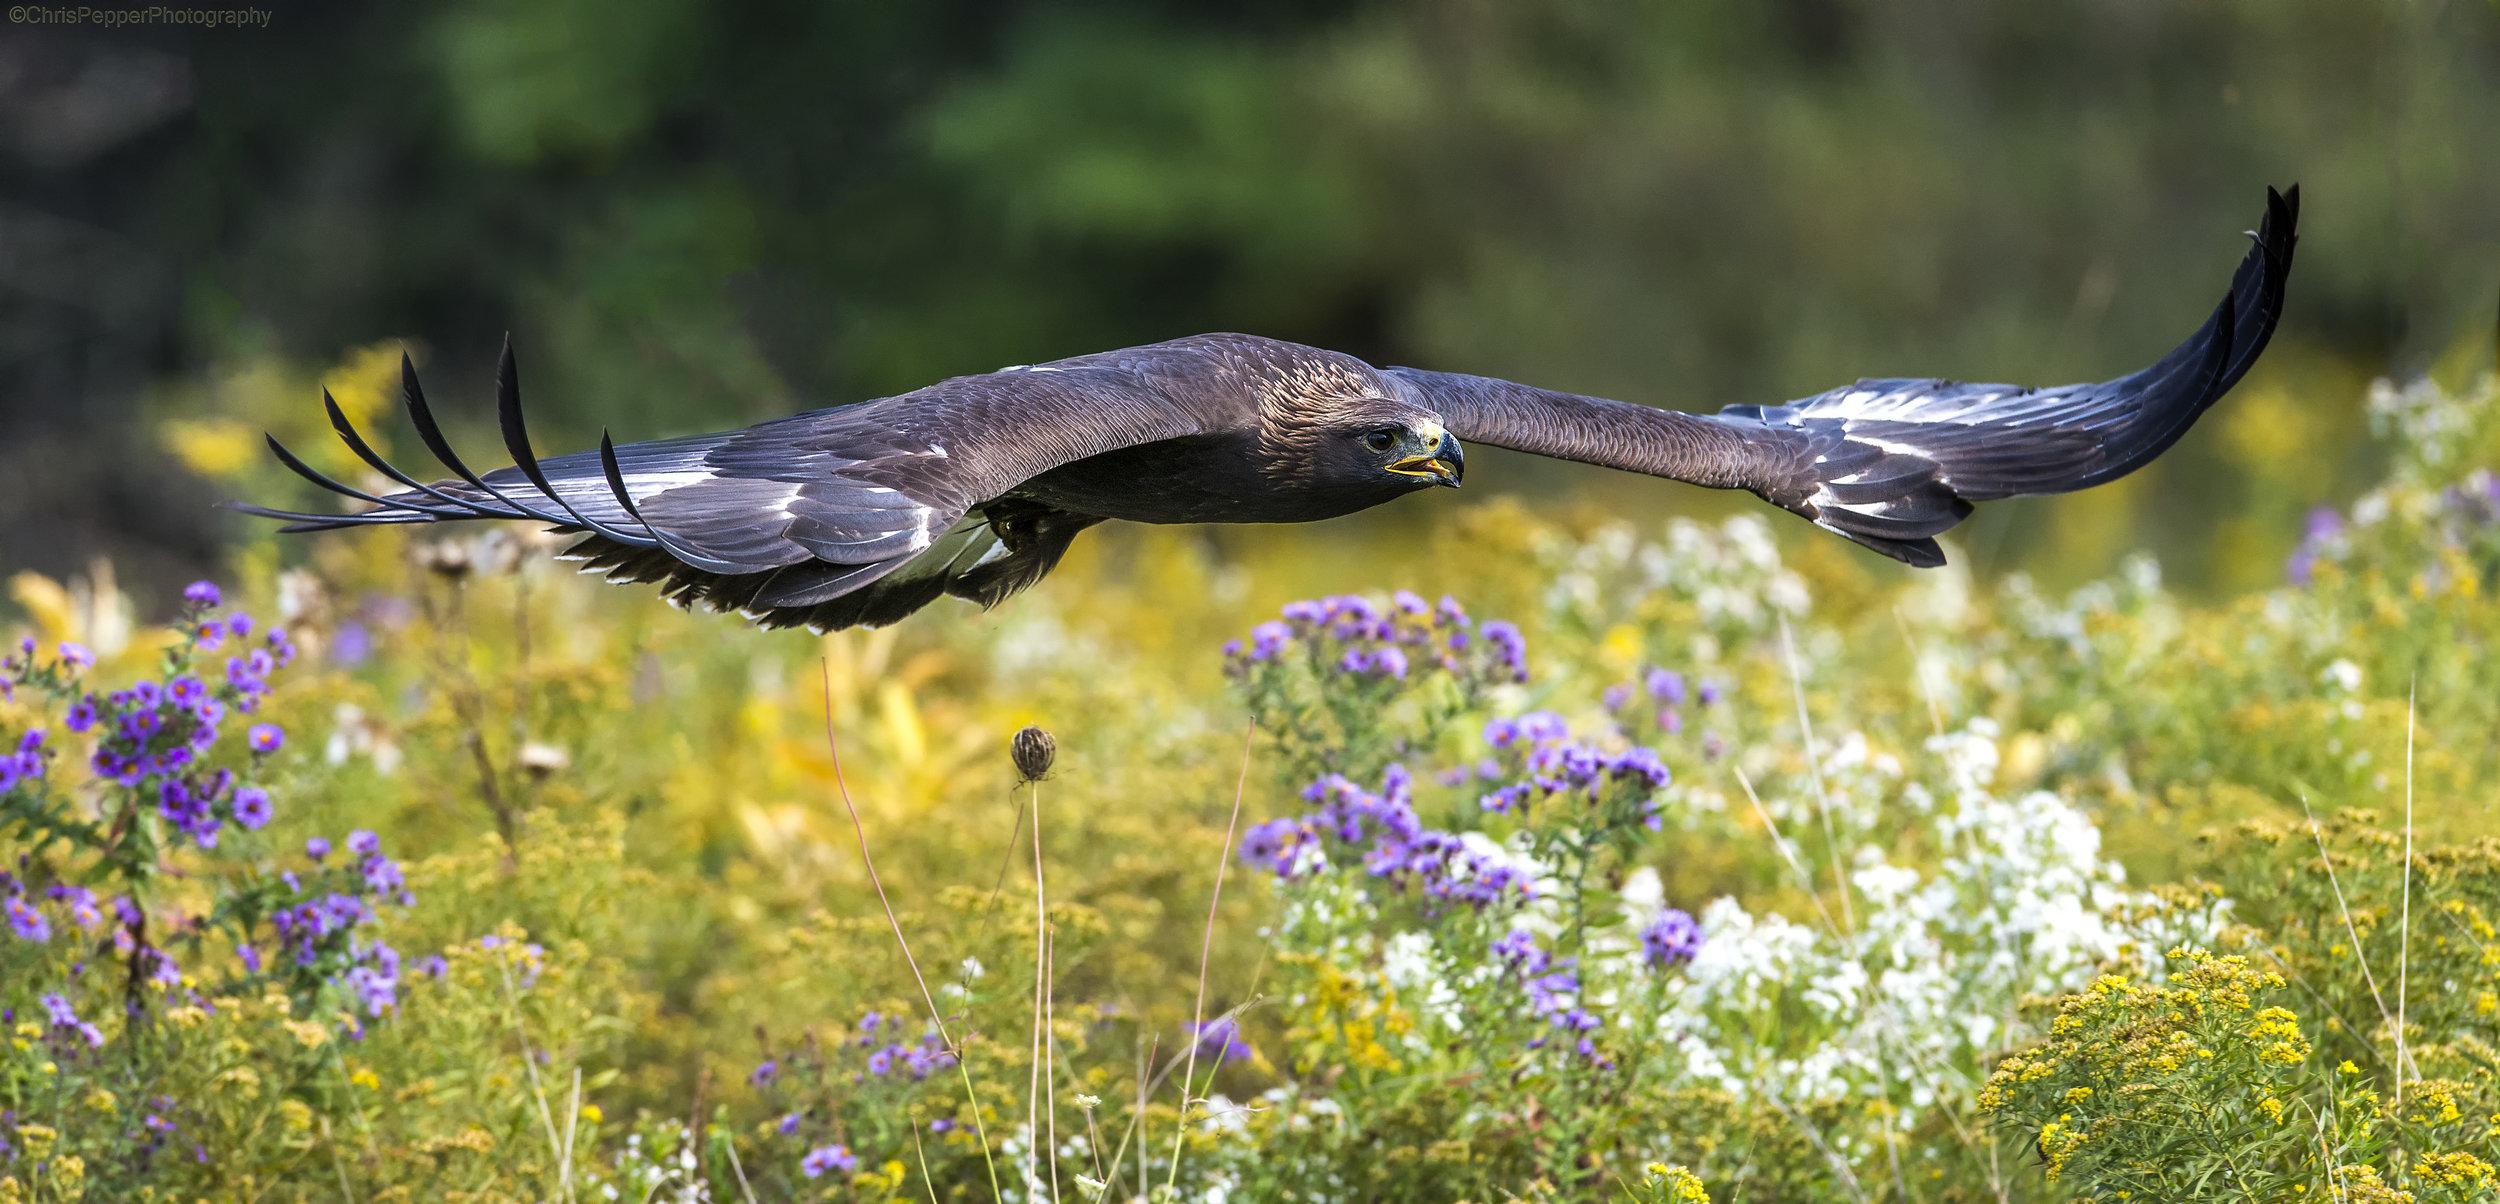 Golden eagle Chris Pepper